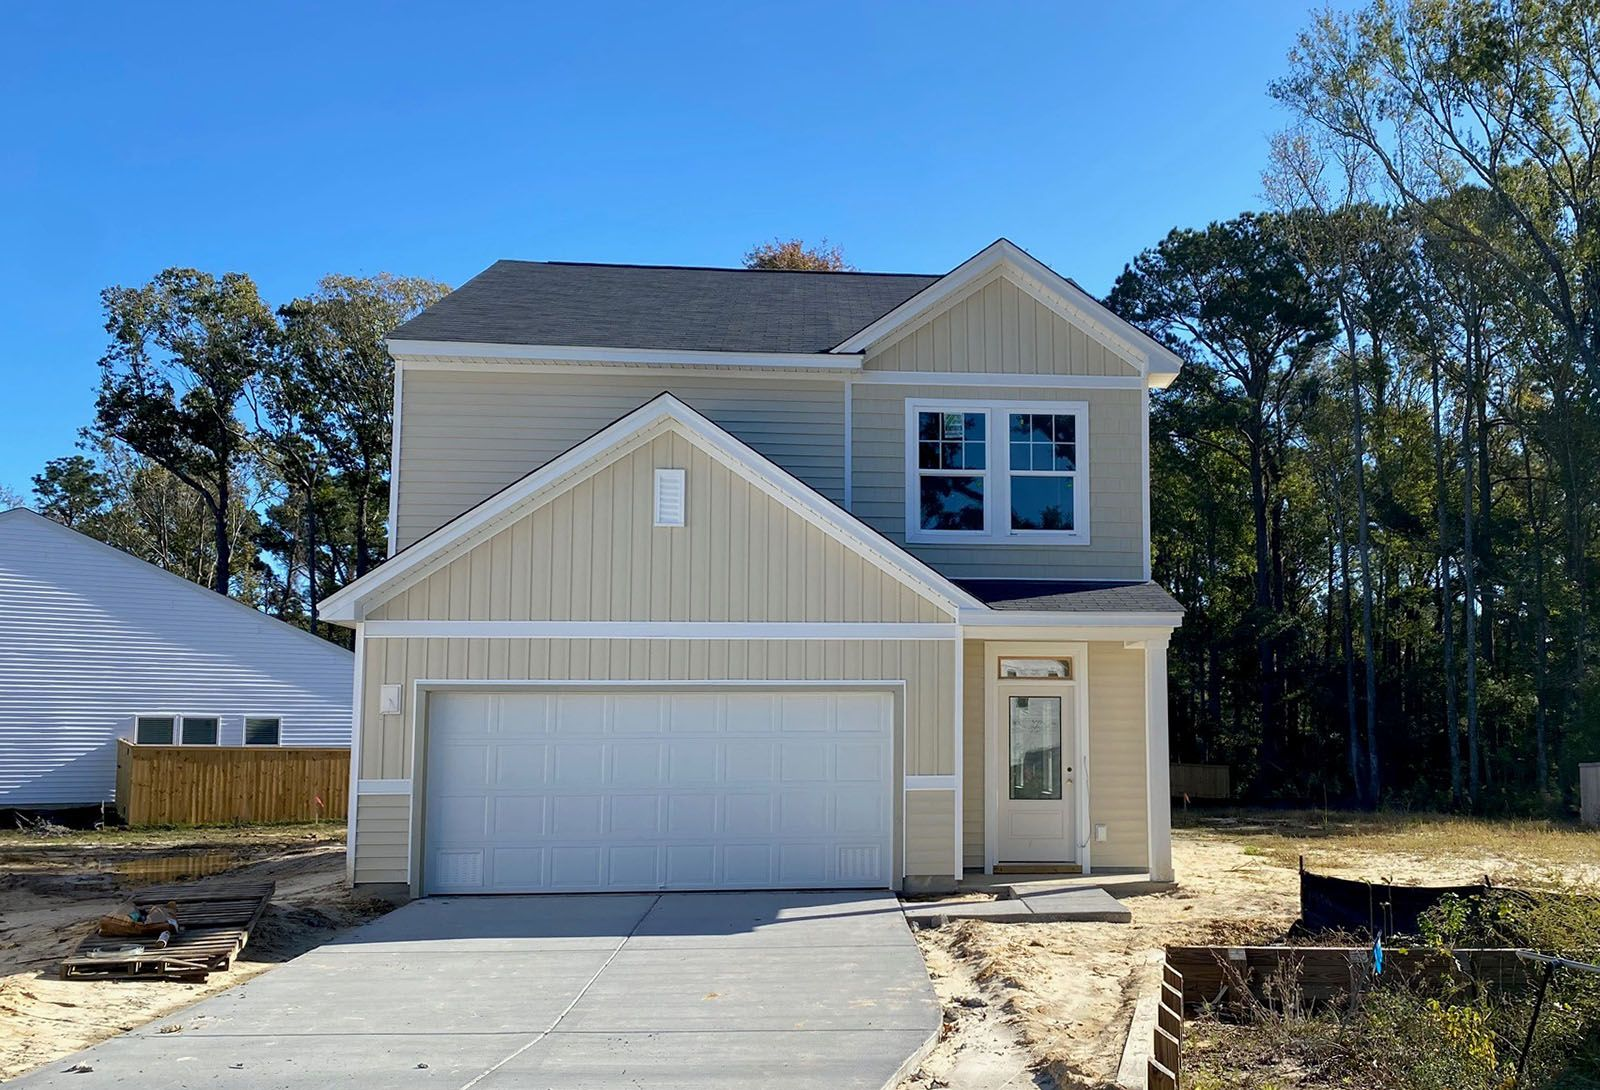 Exterior:1391 Thin Pine Drive, Homesite 16 Elevation Image 1